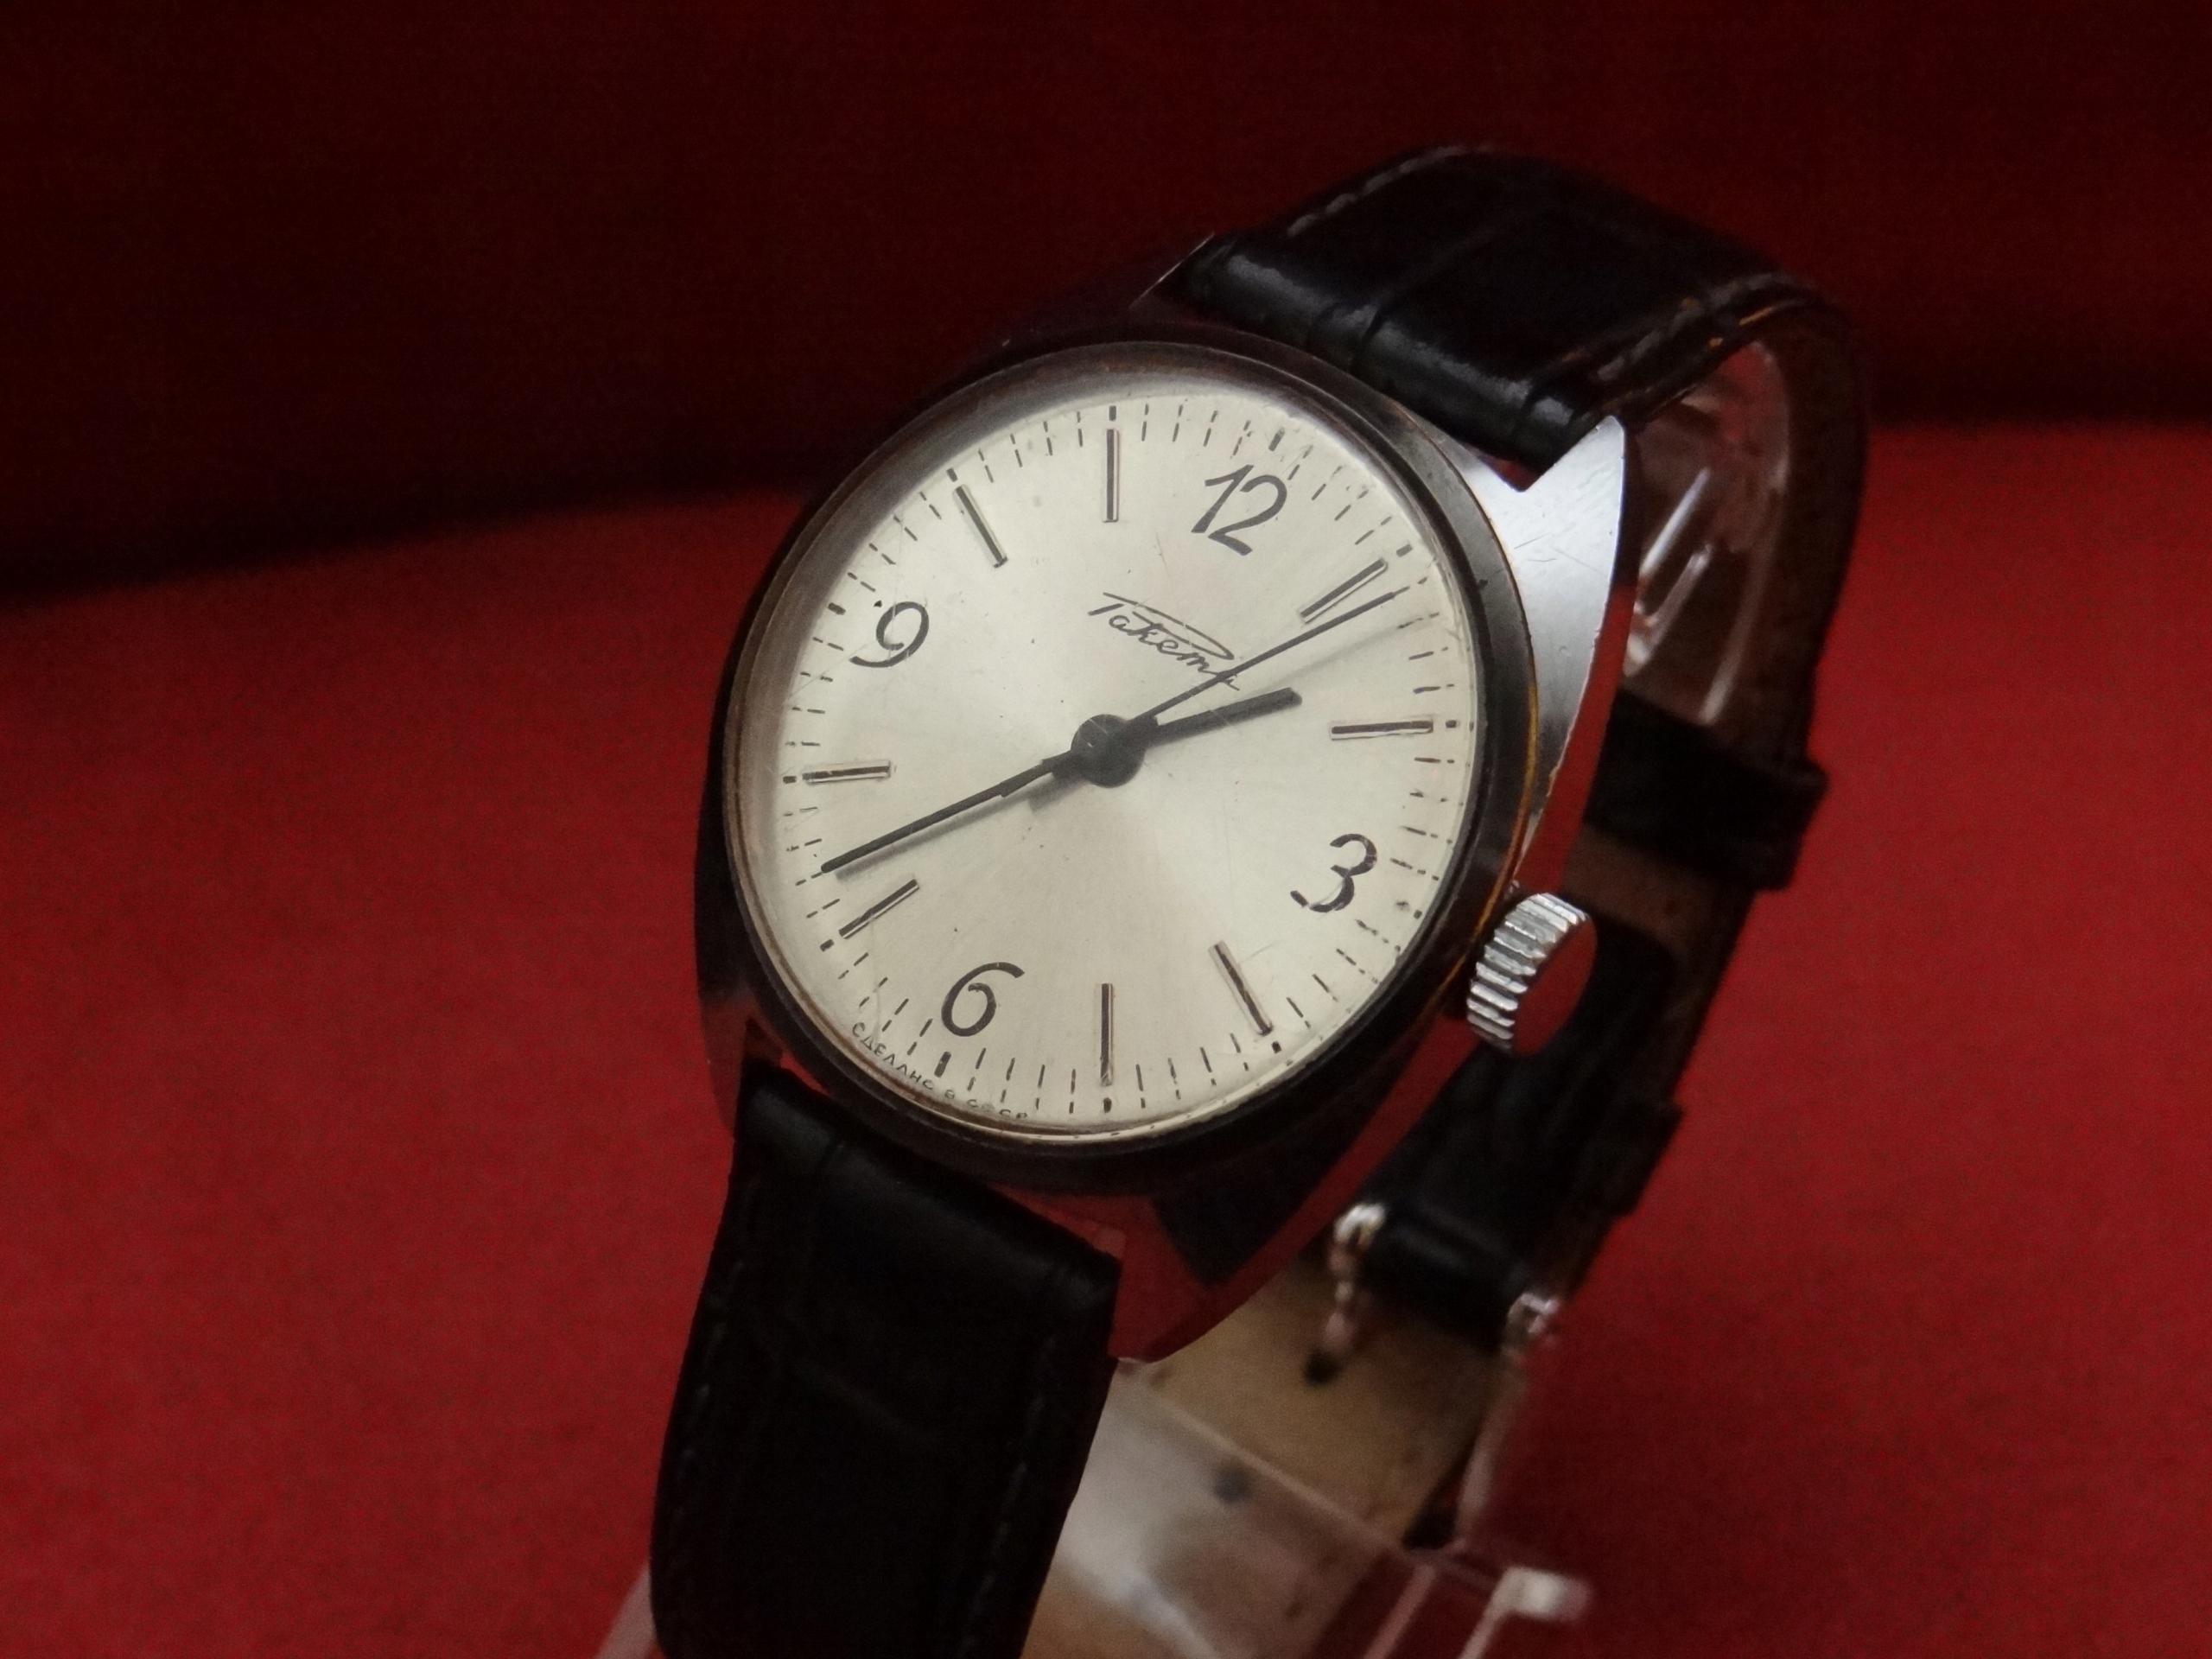 ROSYJSKI zegarek ___ RAKIETA ___ cccp SUPER STAN